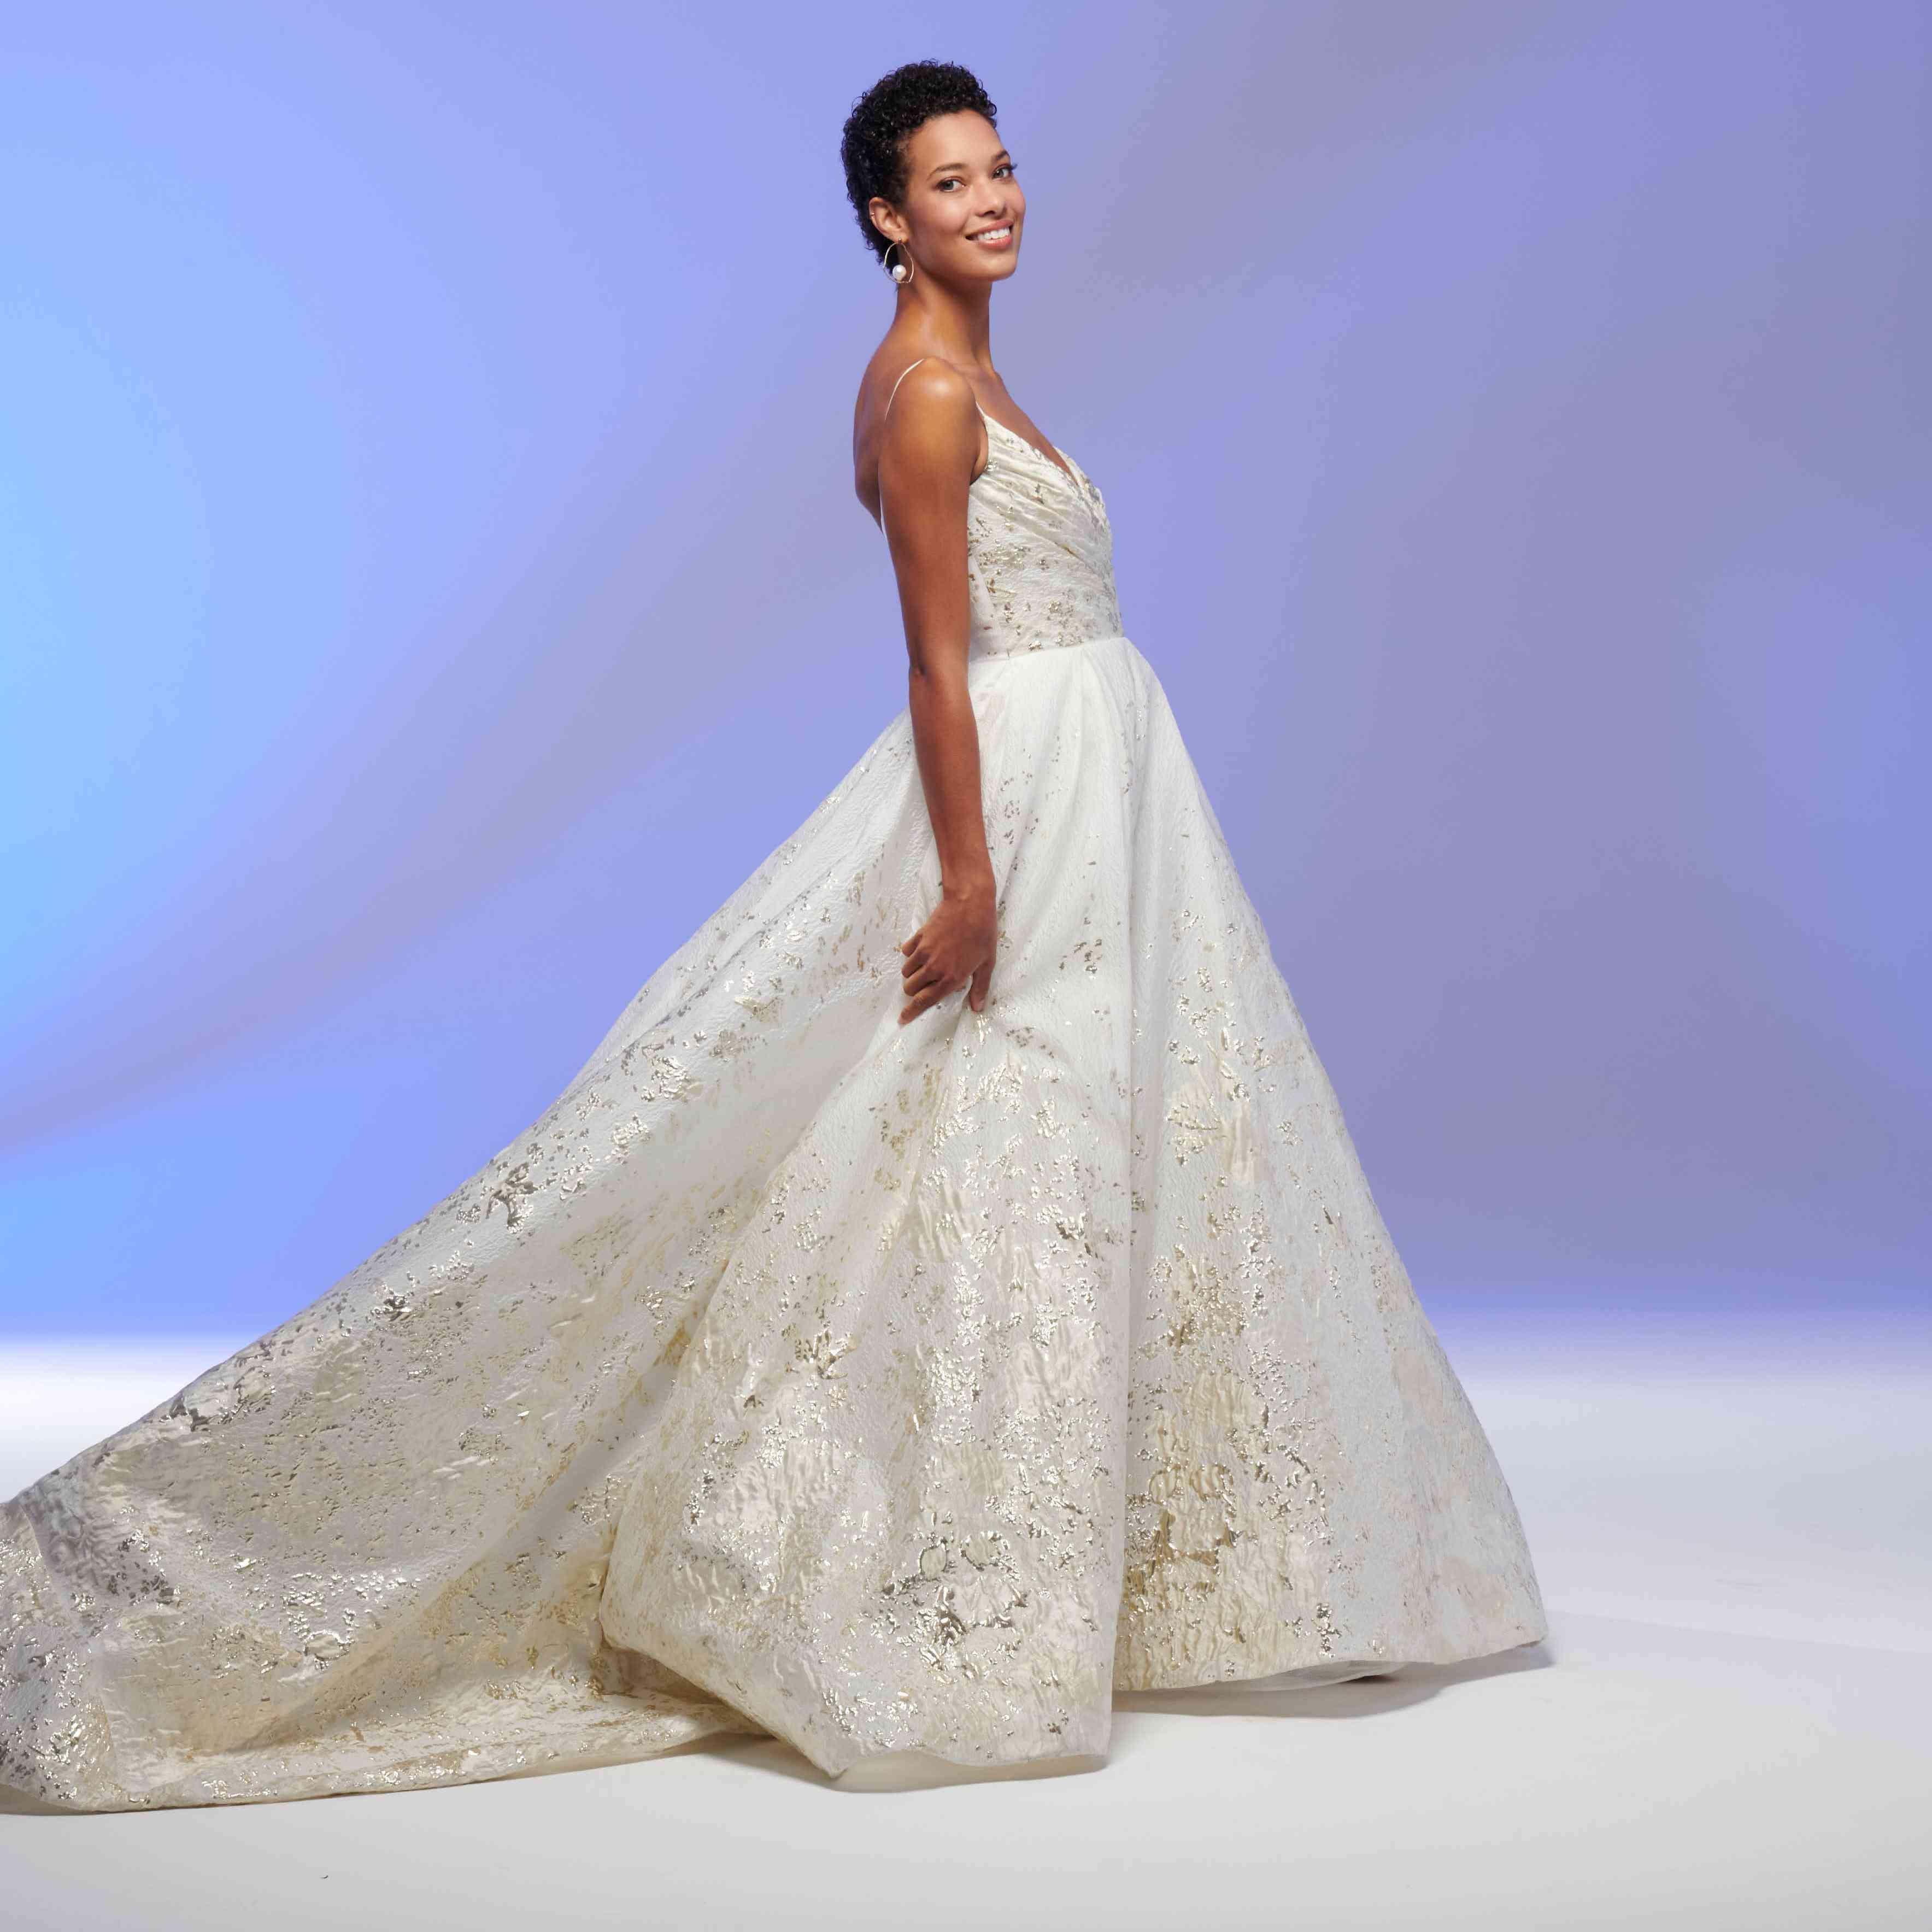 Valencia gold wedding dress